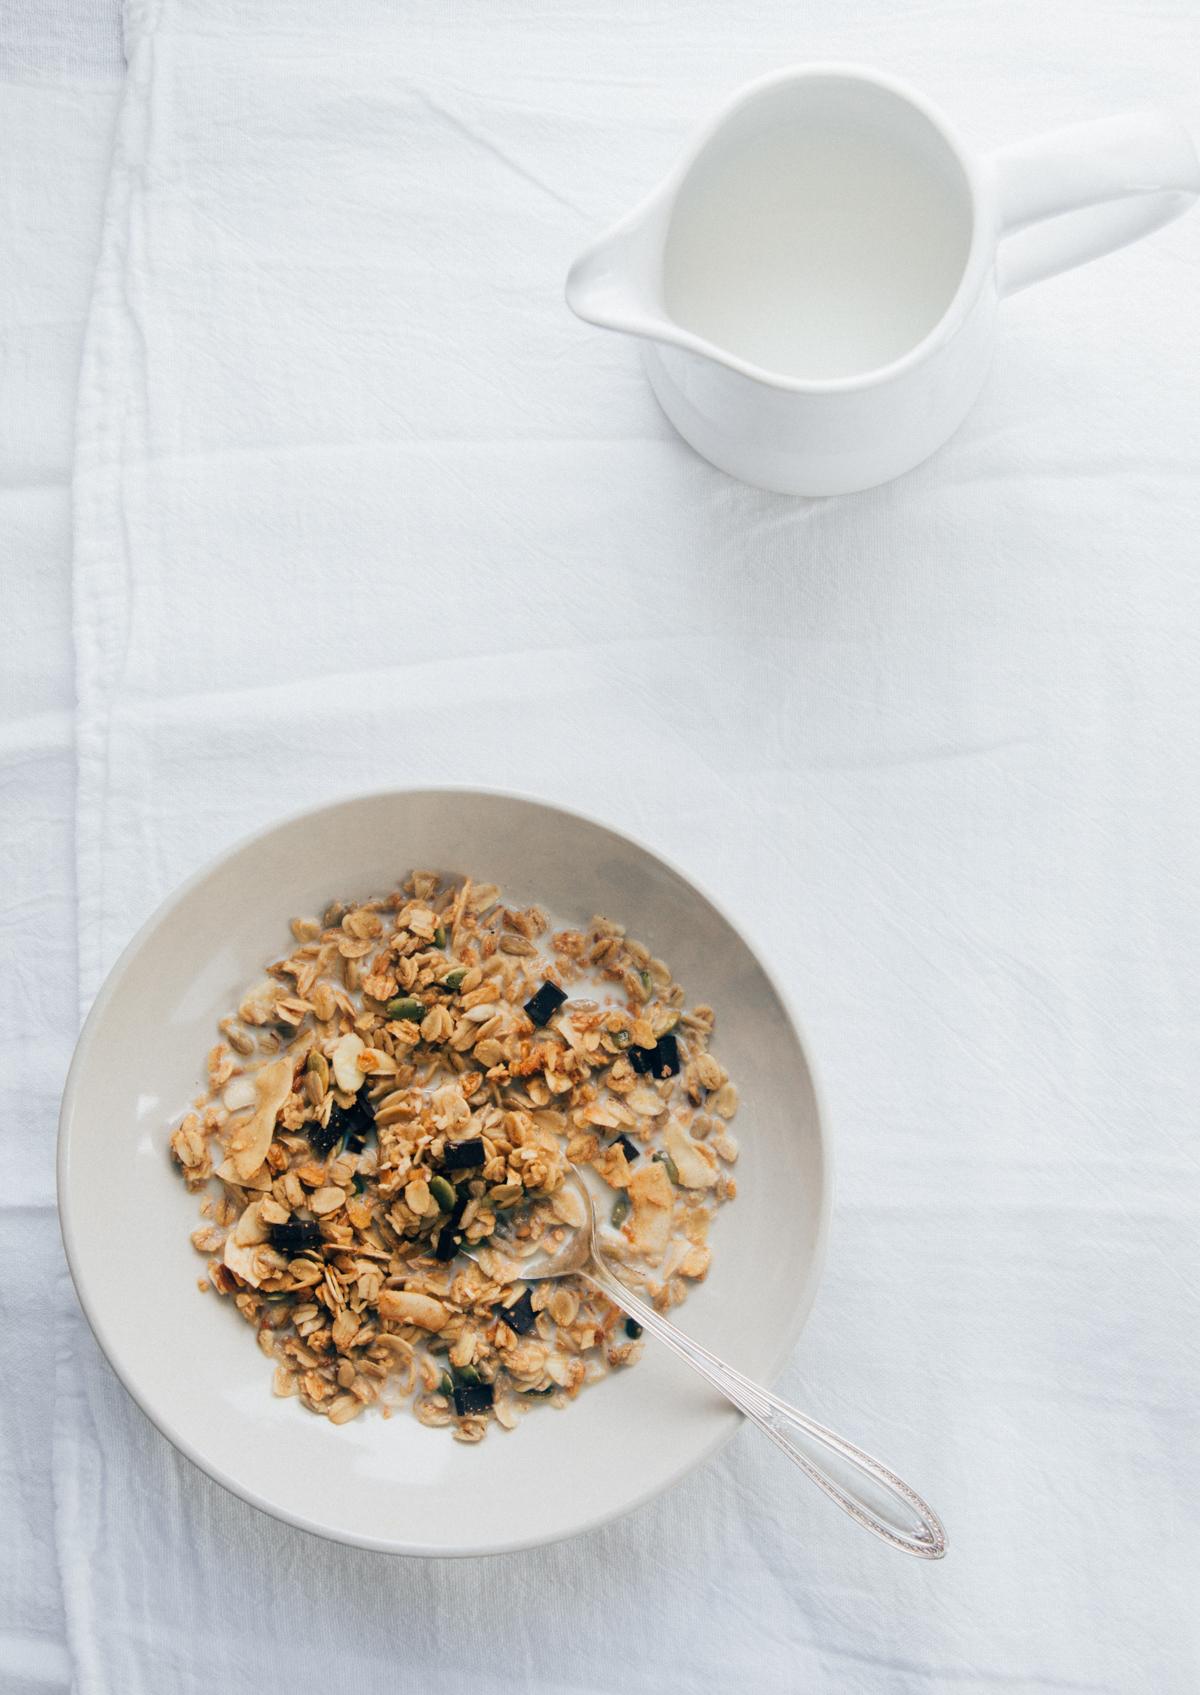 Coconut Granola  with coconut, dark chocolate and almonds./ Photo:  Melissa DiPalma